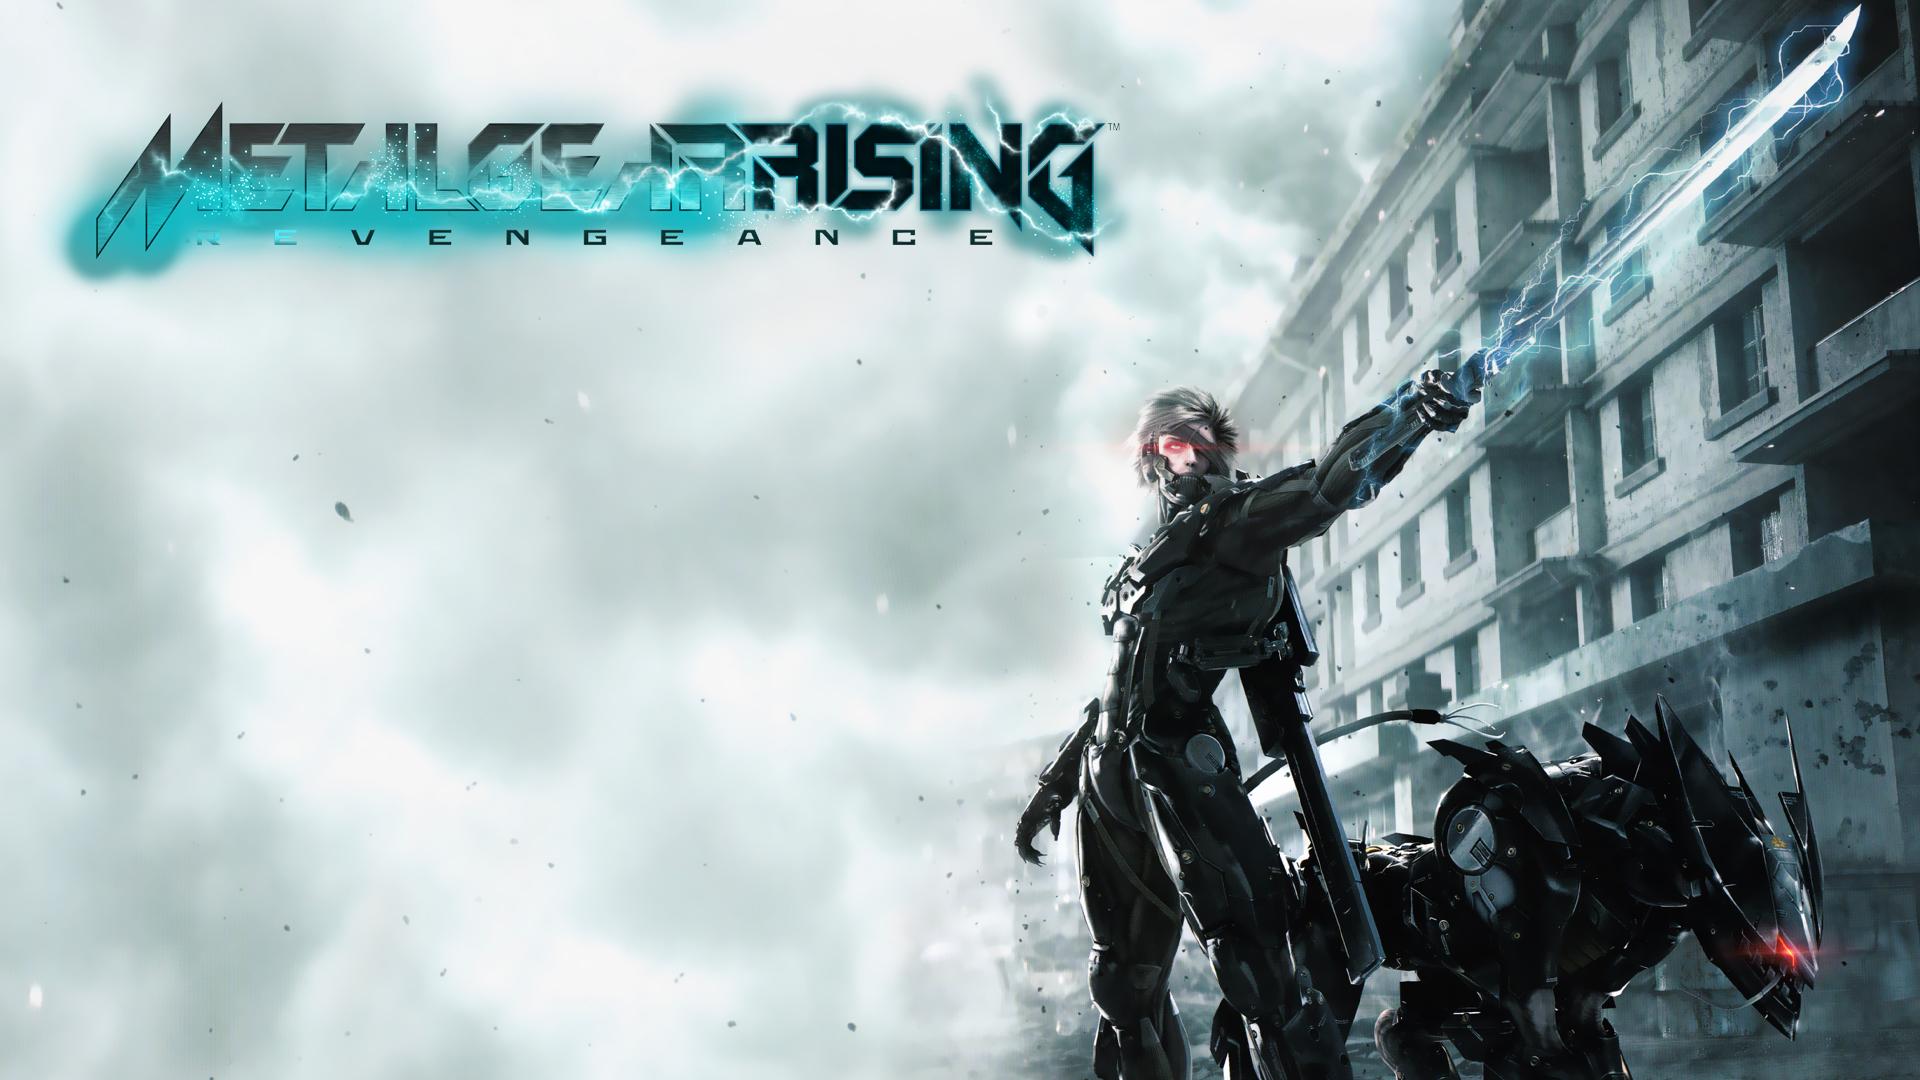 Mgs Rising Wallpaper